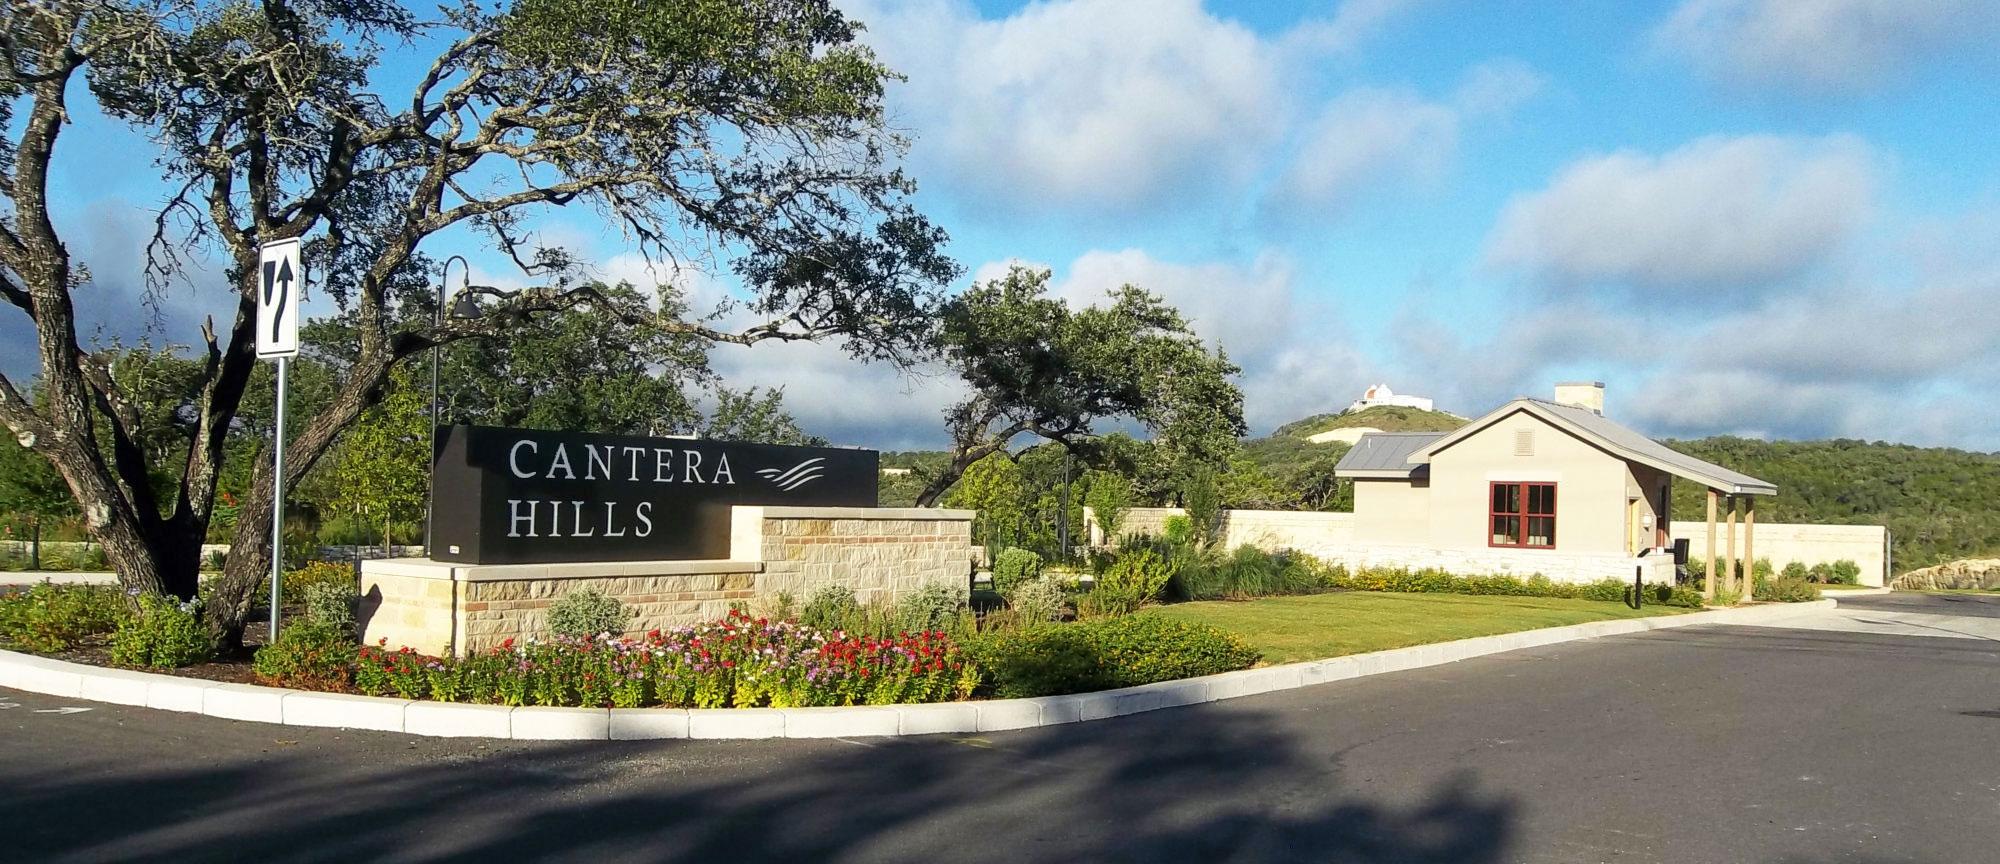 Cantera Hills San Antonio